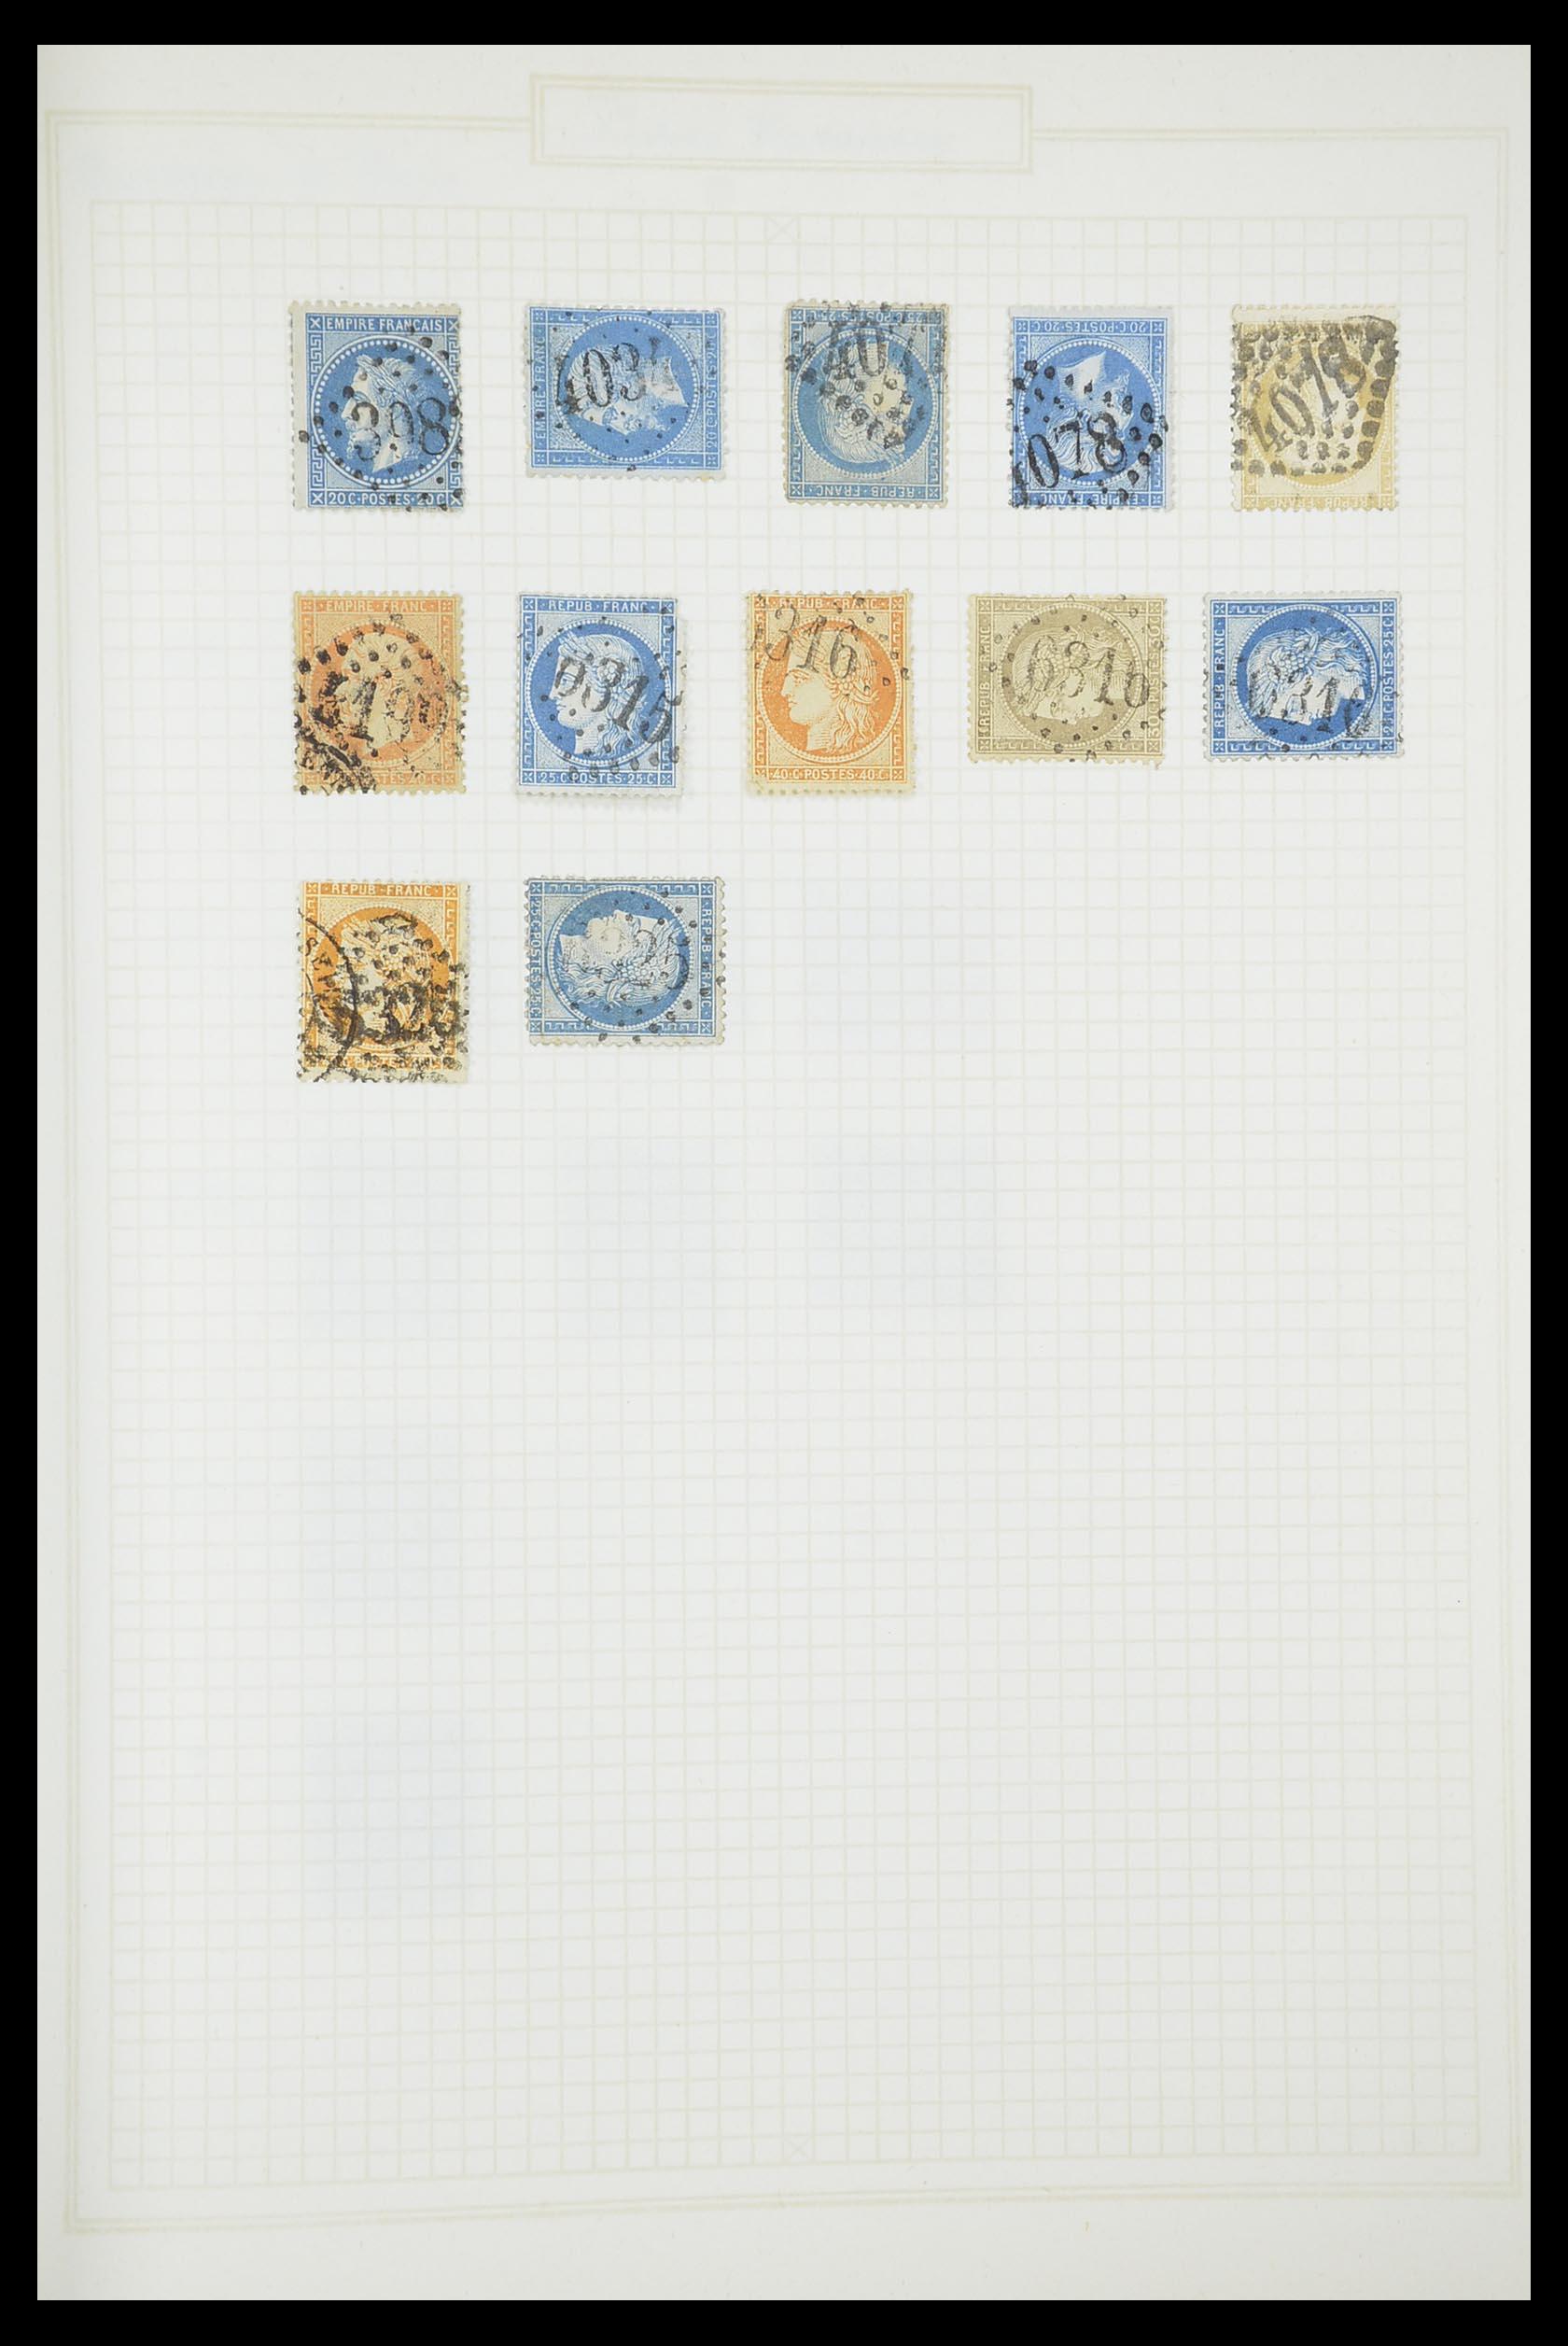 33851 014 - Postzegelverzameling 33851 Frankrijk klassiek stempels.